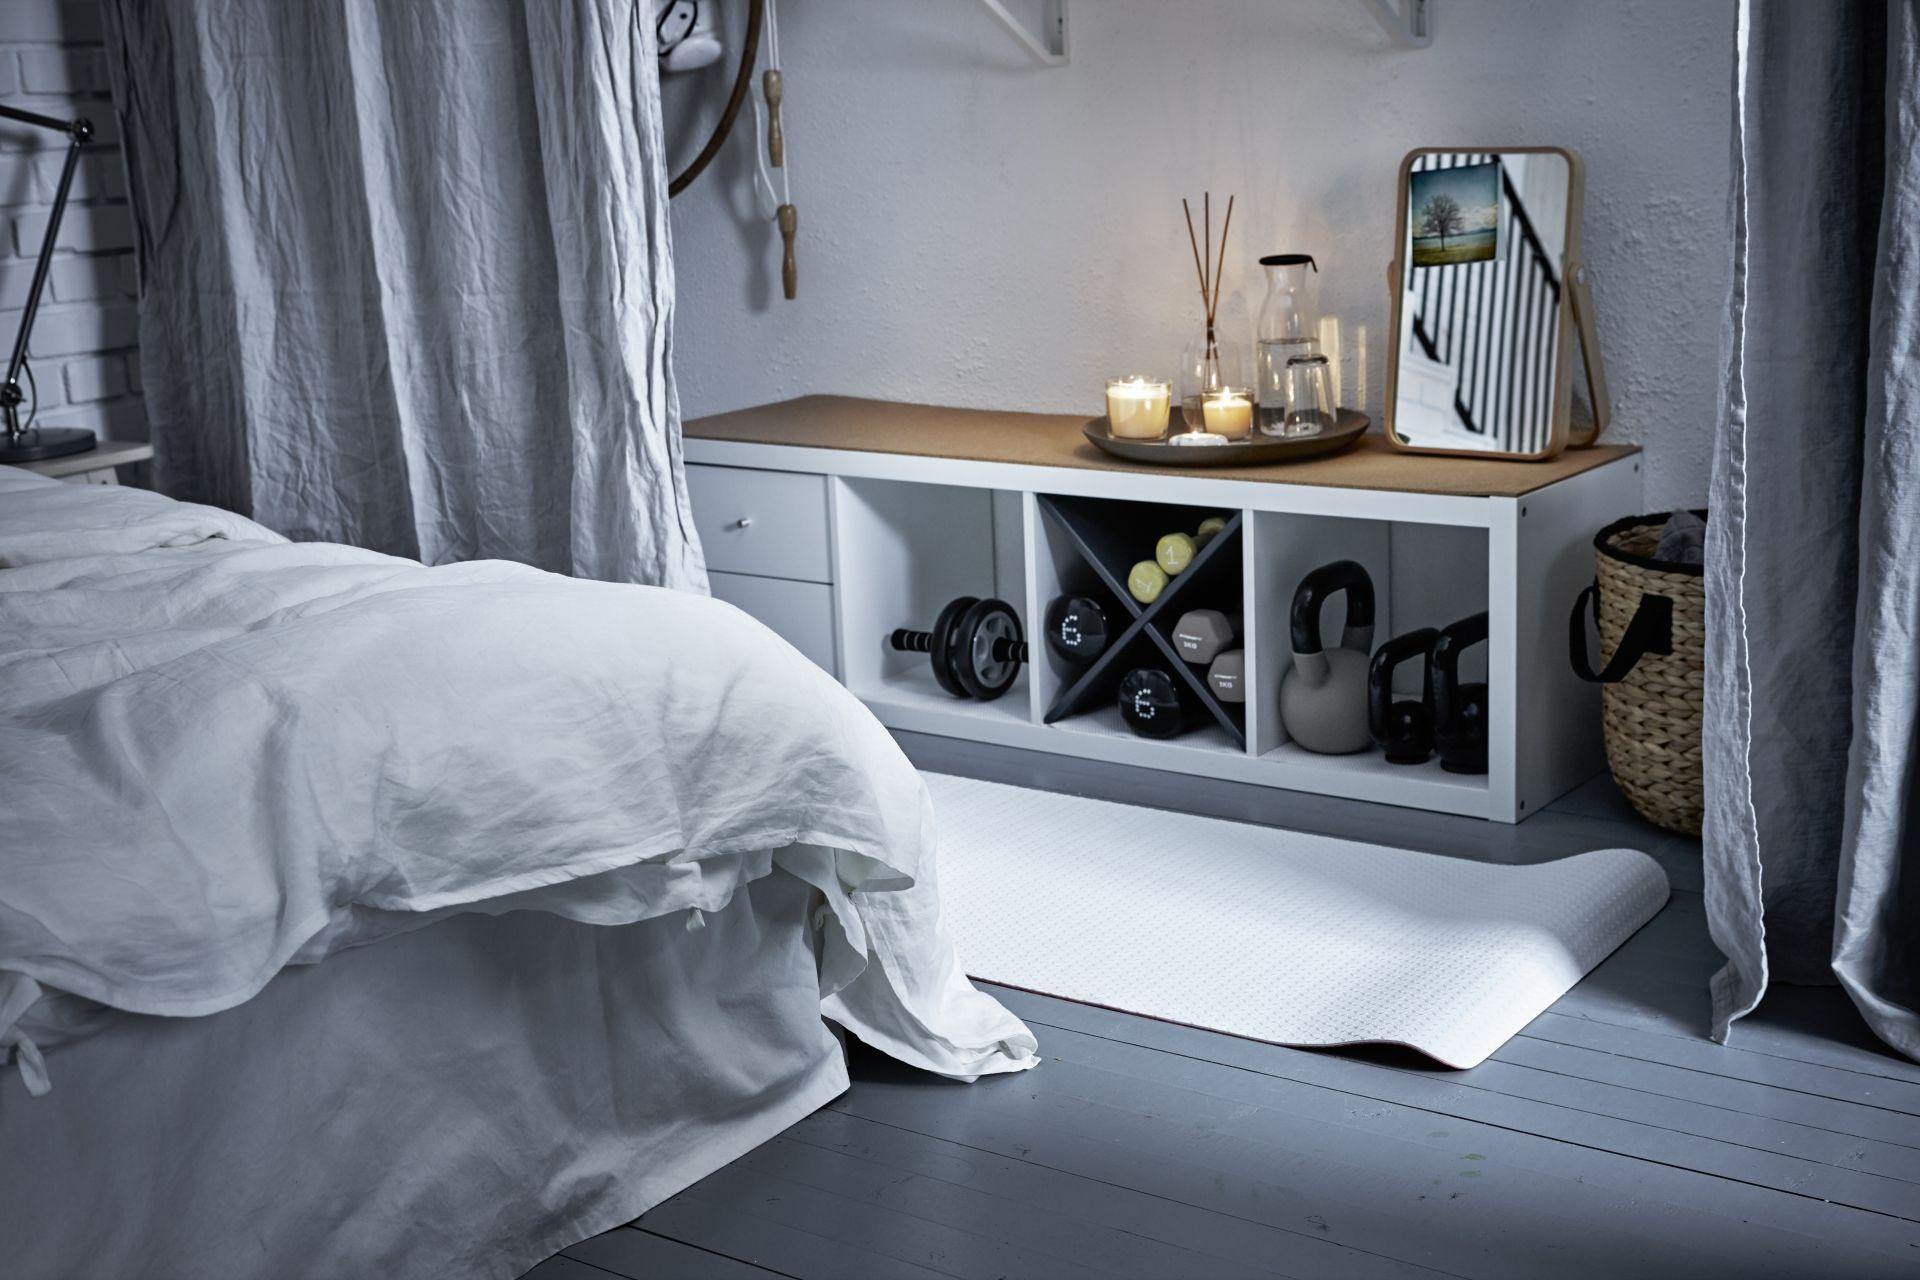 KALLAX Open kast, wit, 42x147 cm - IKEA | Home gym kamer, Home gym decor, Open kast